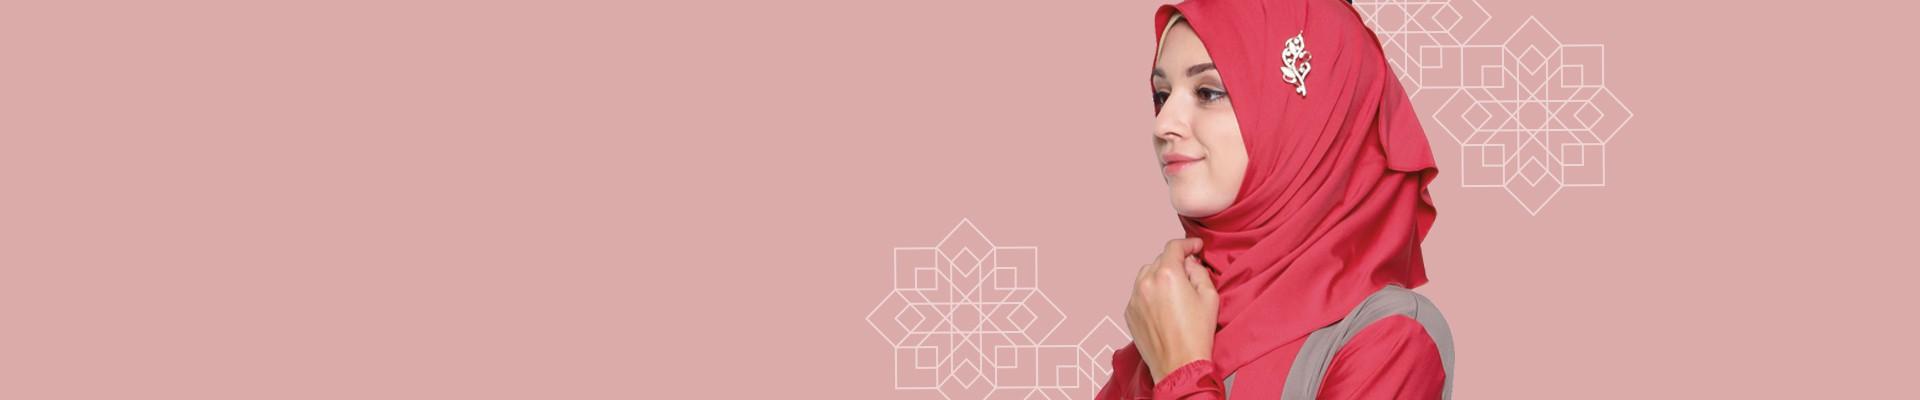 Jual Aksesoris Muslim - Hiasan Hijab Terbaru